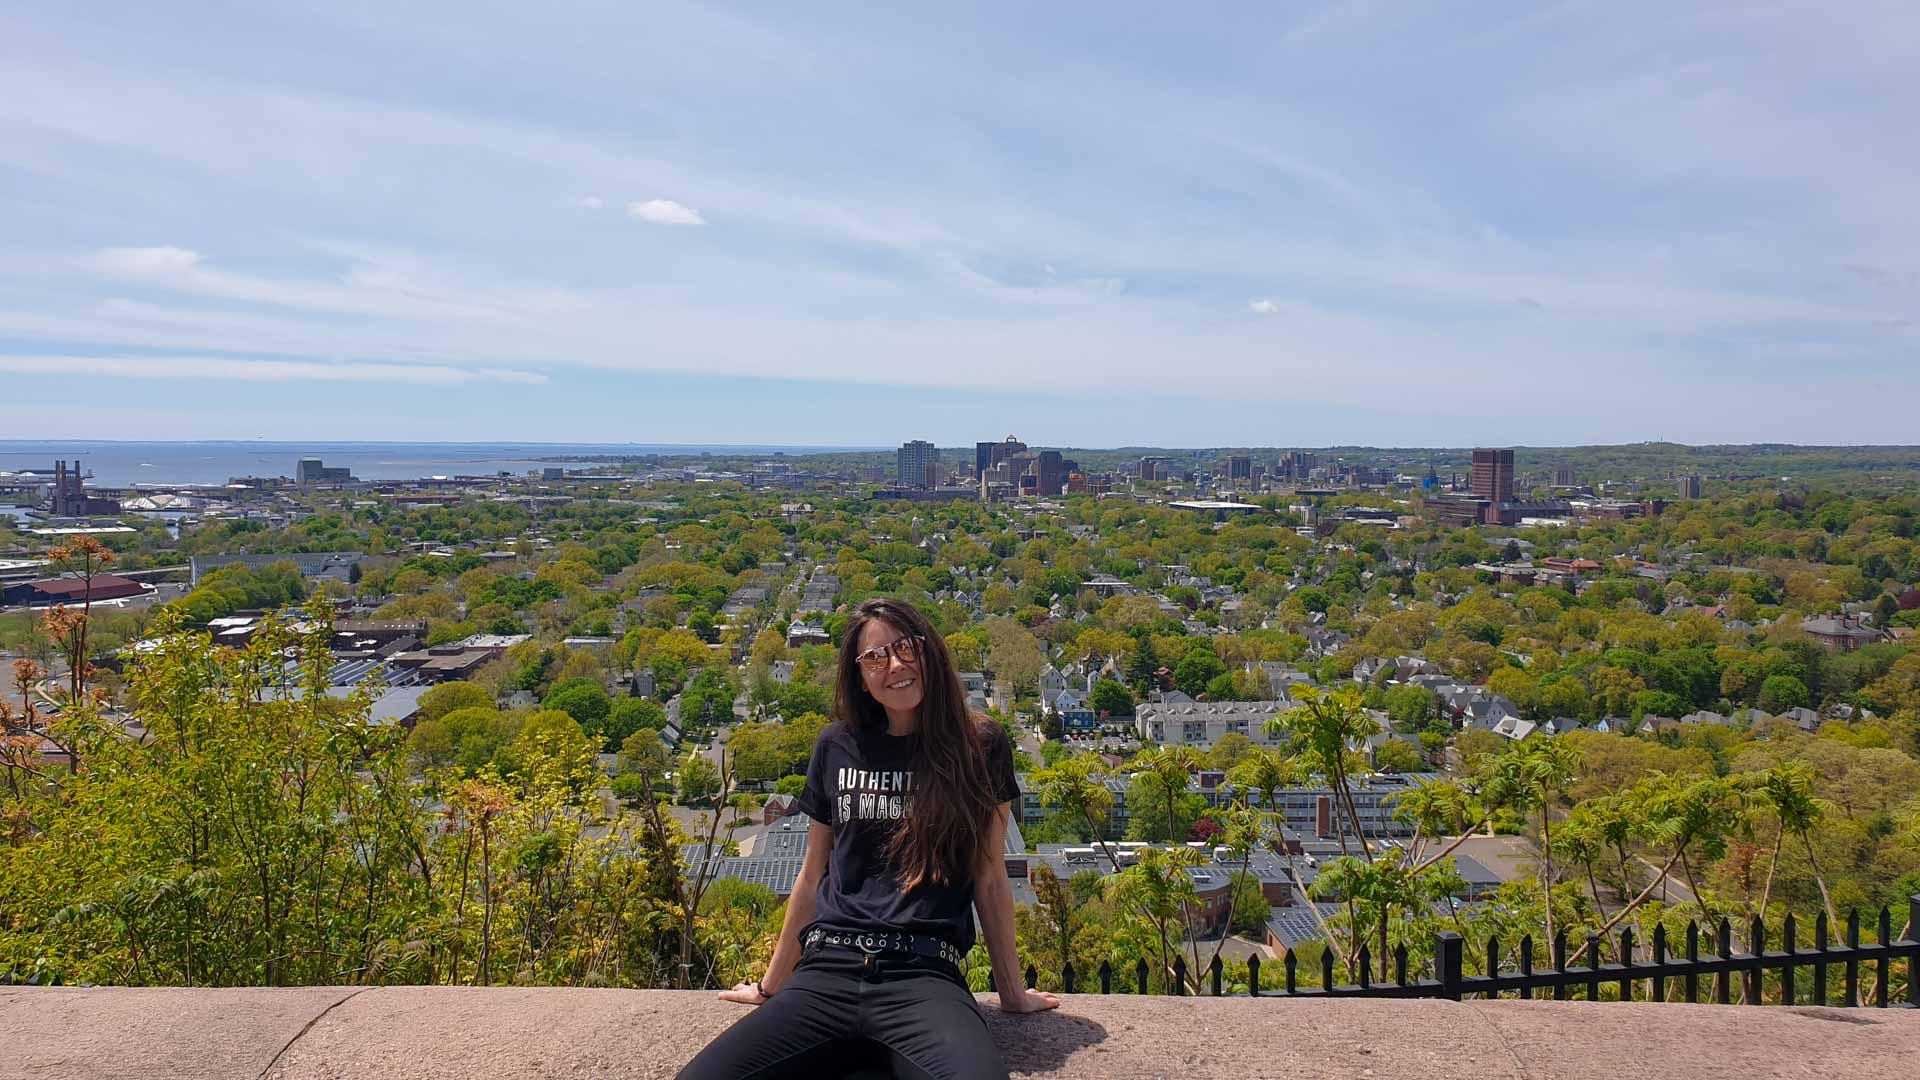 Vistas del downtown de New Haven desde la cima de East Rock, Connecticut